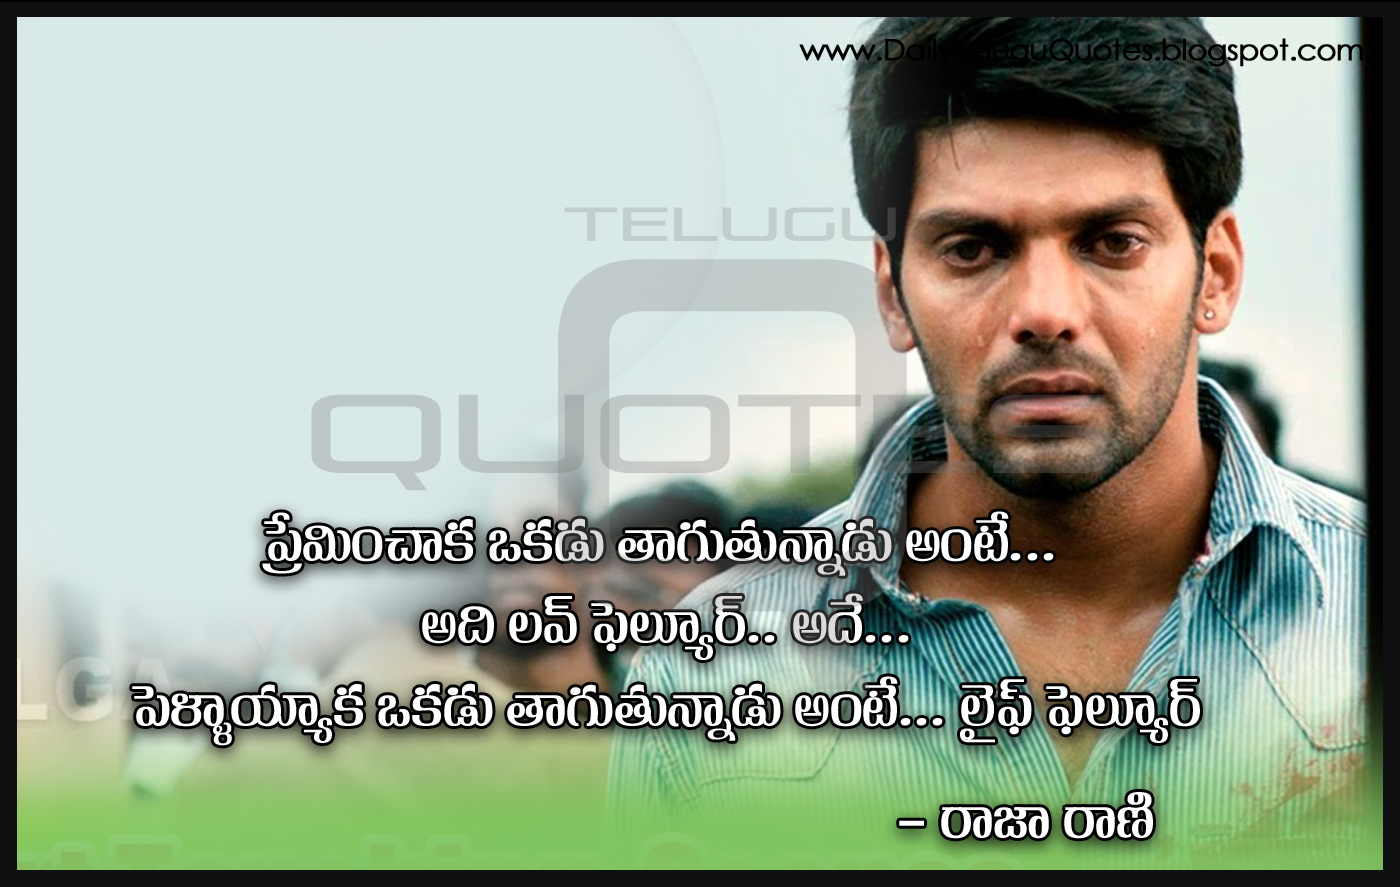 Arya Dialogues In Raja Rani Movie Telugu Quotes Images Life